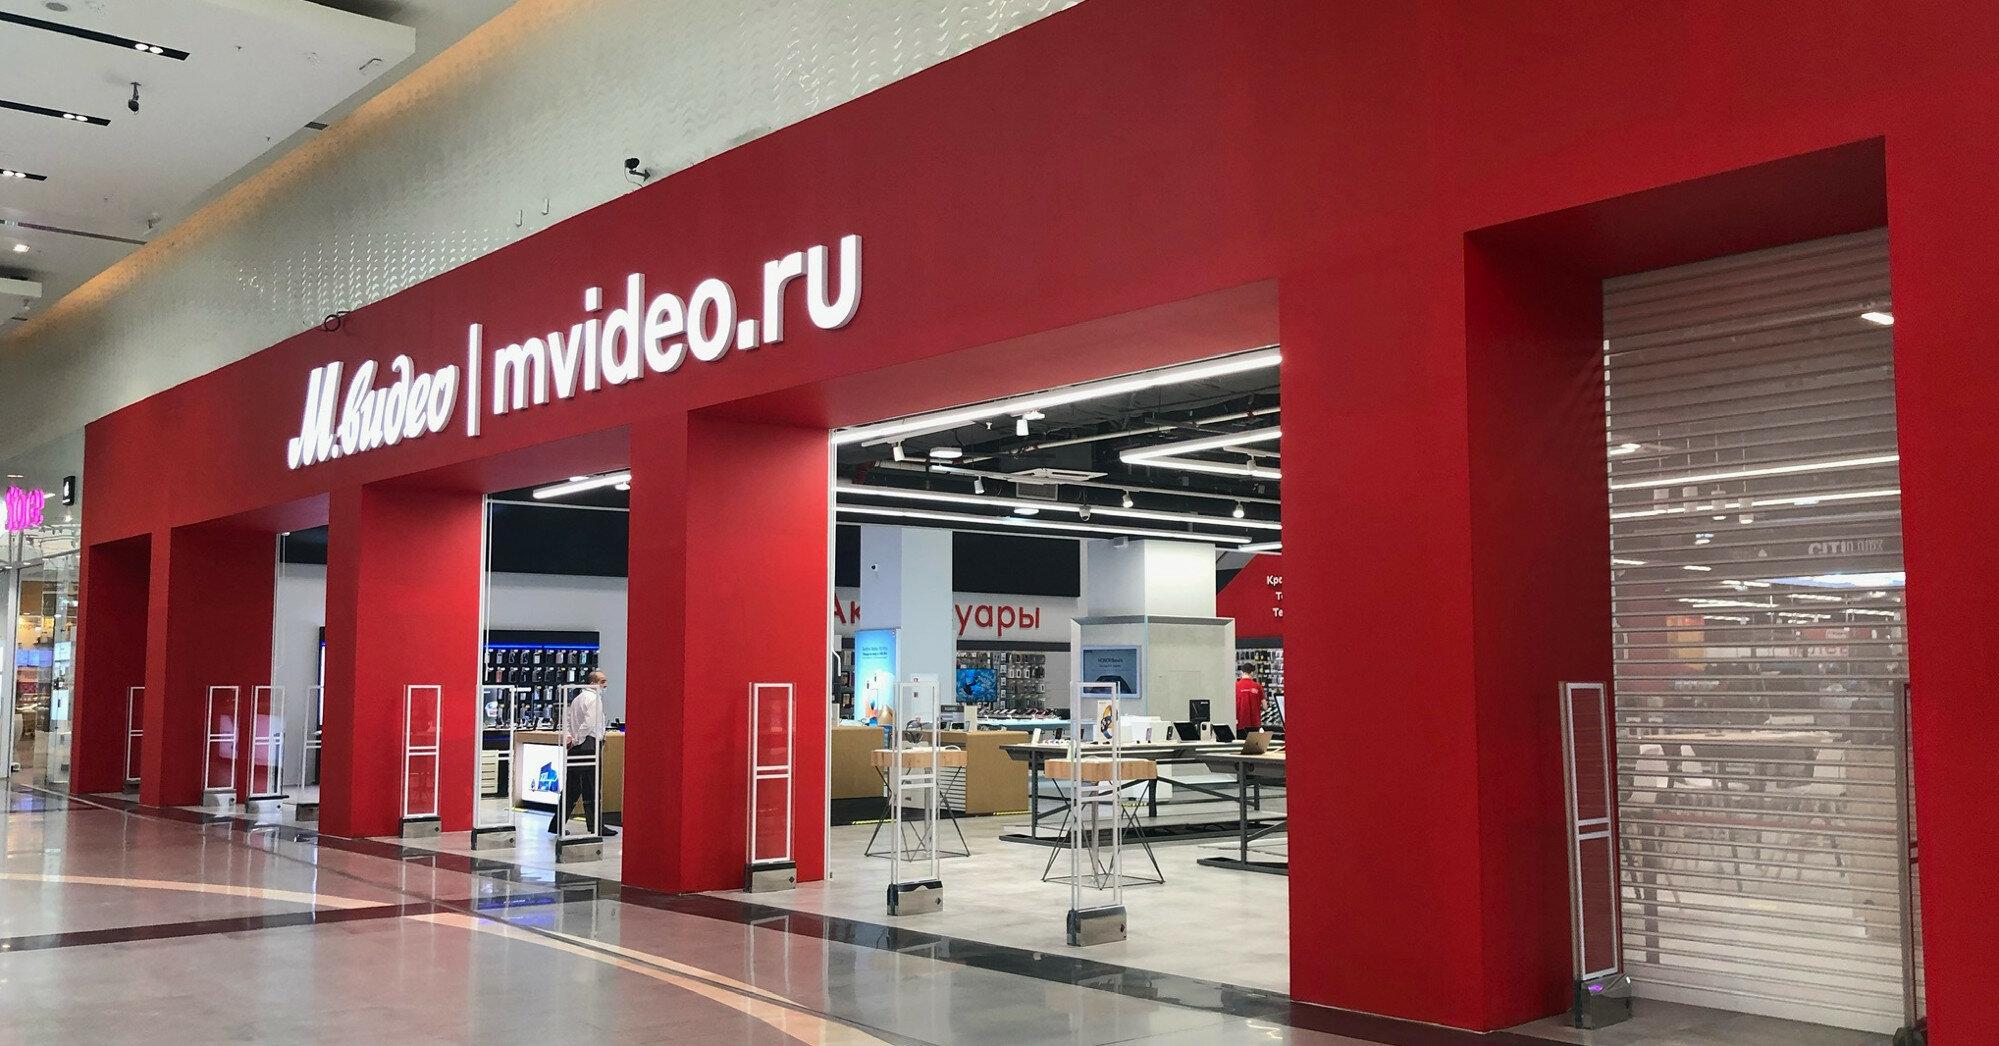 Санкции против Беларуси ударили по бизнесу РФ